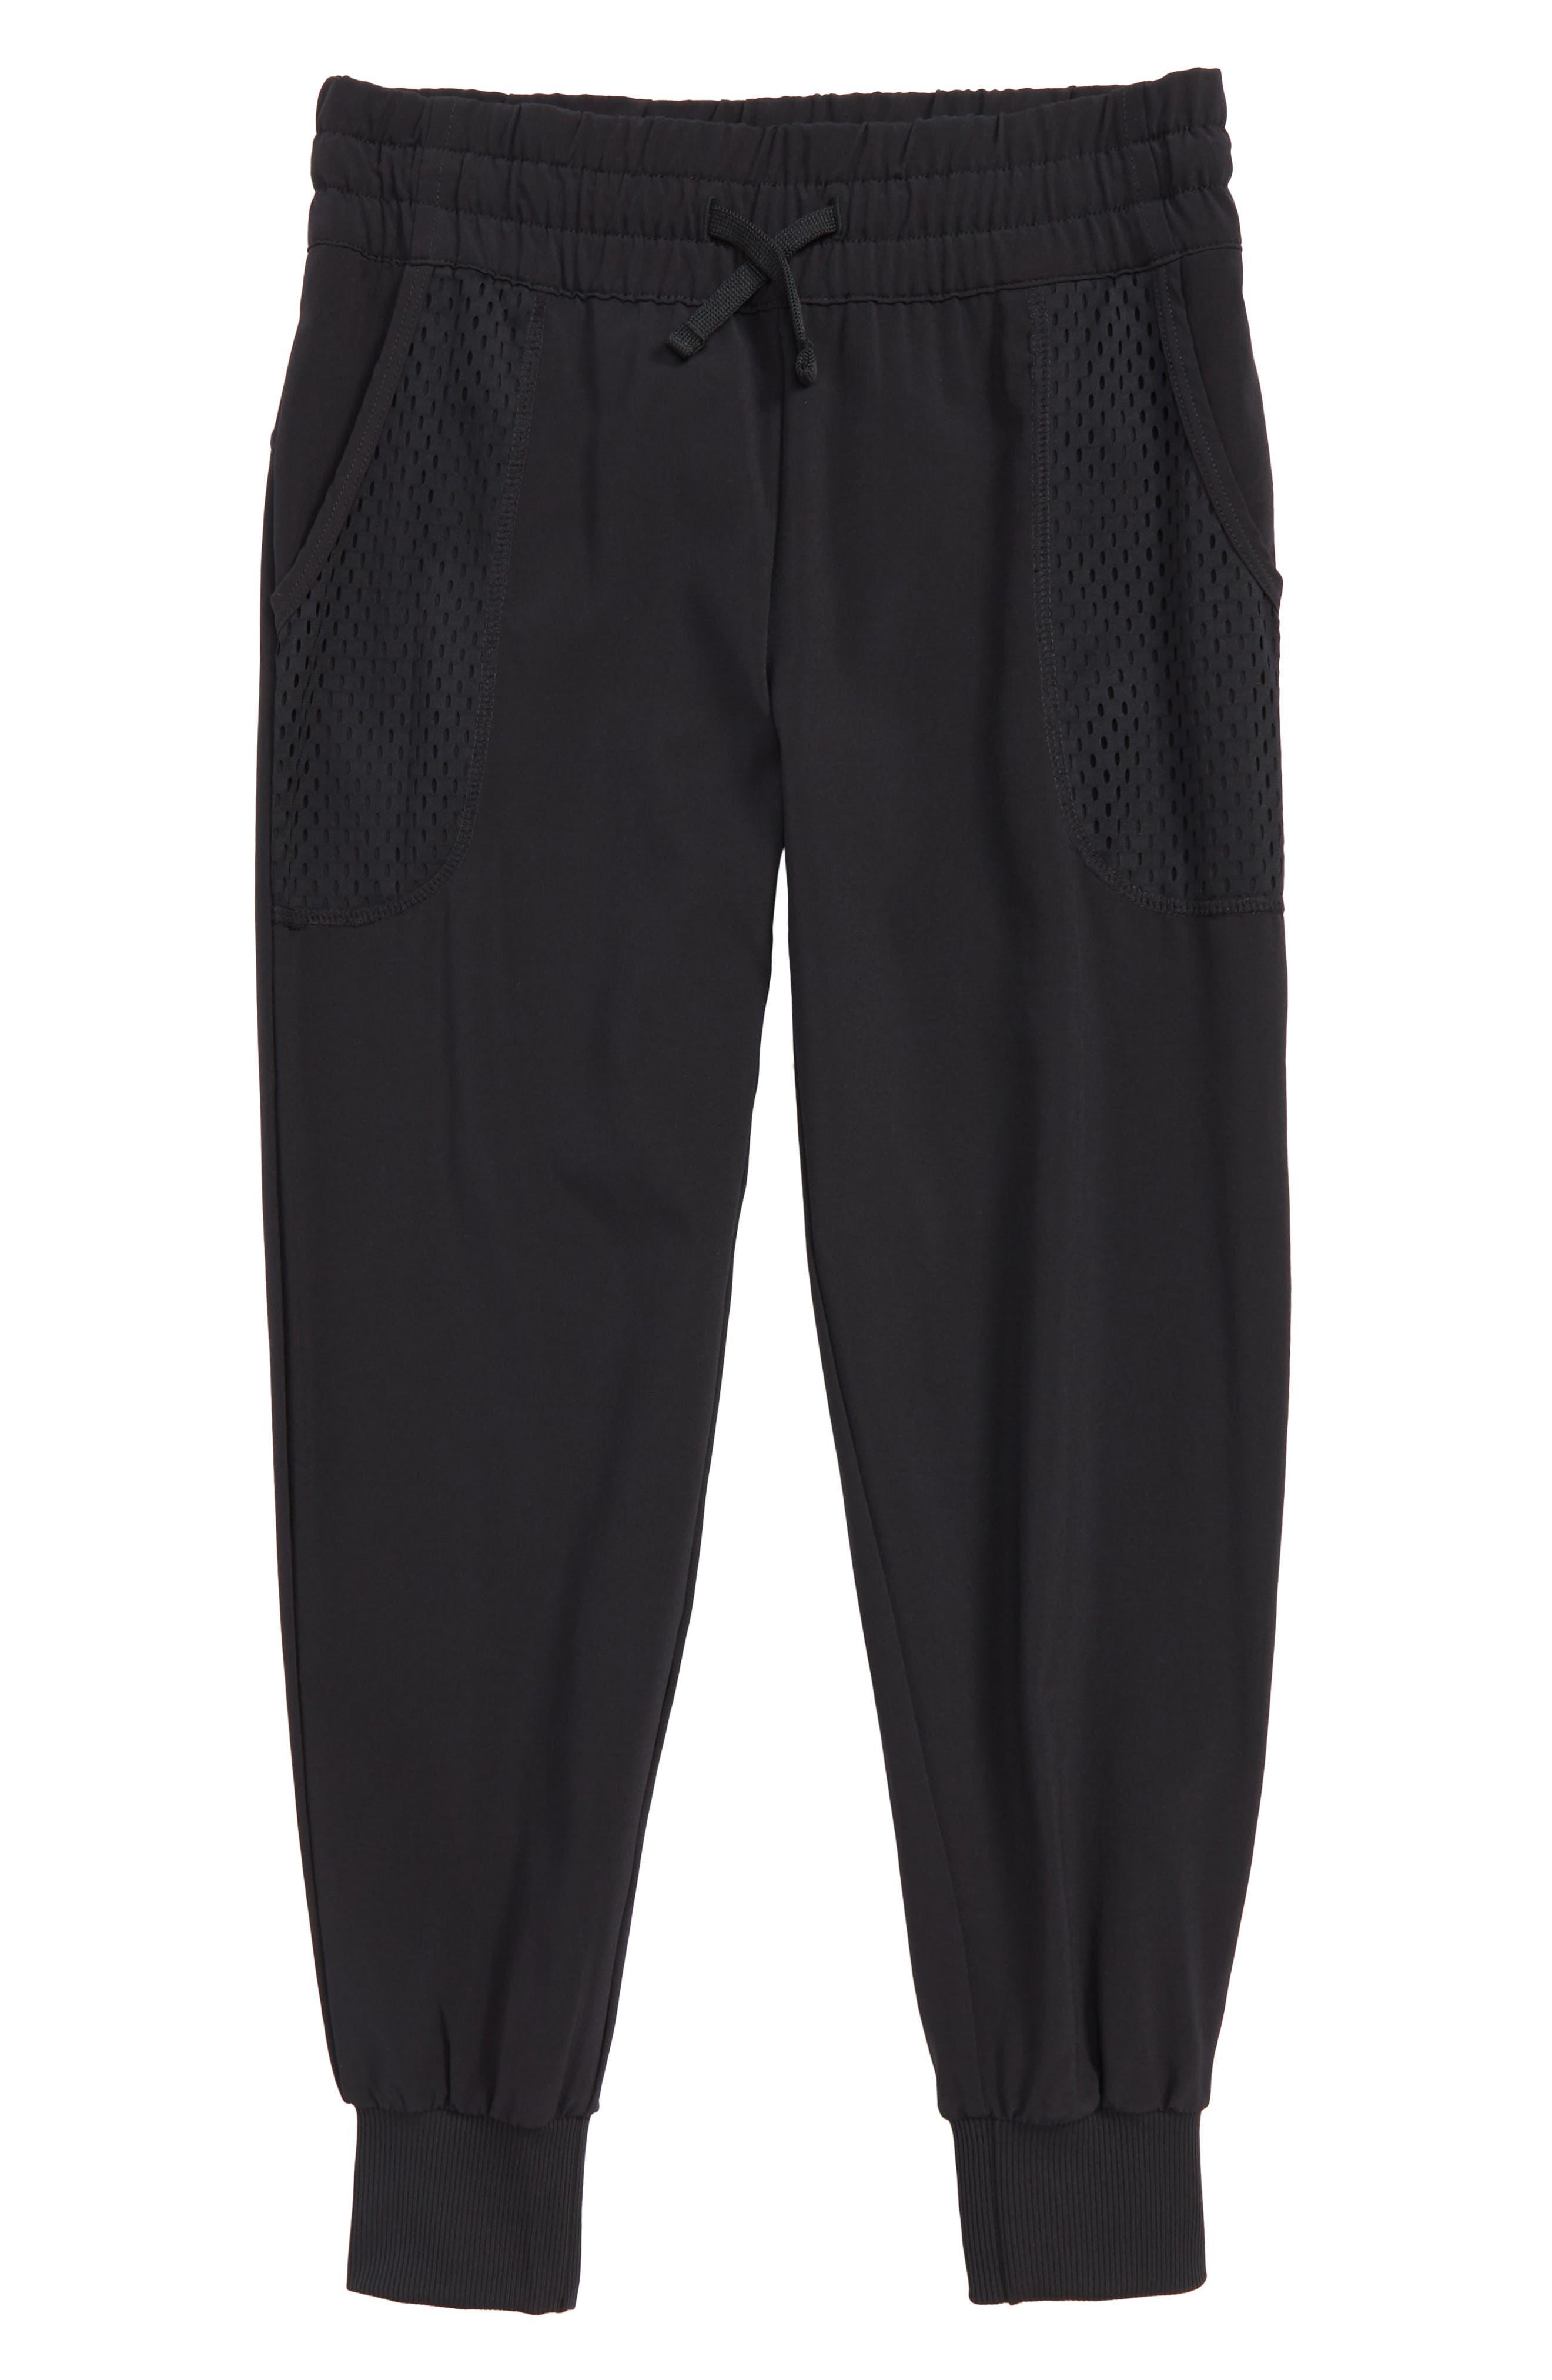 Mesh Pocket Jogger Pants,                             Main thumbnail 1, color,                             Black